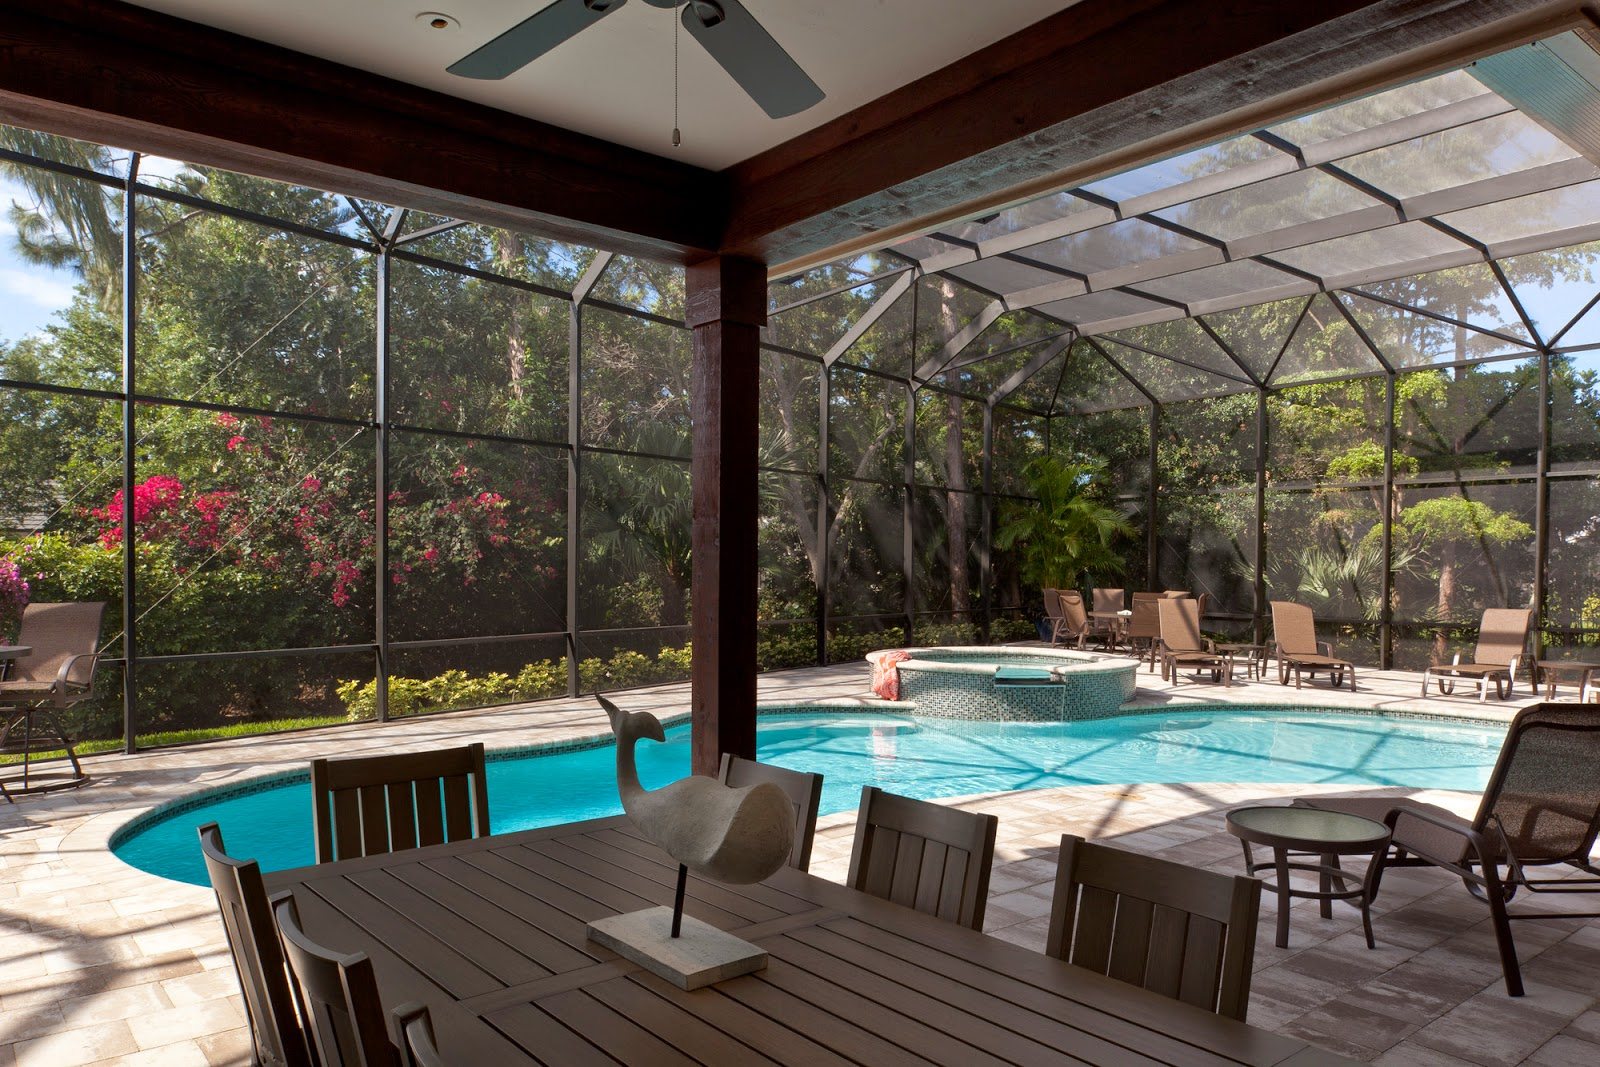 Bcbe Construction Llc Upgrade Your Pool Outdoor Lanai